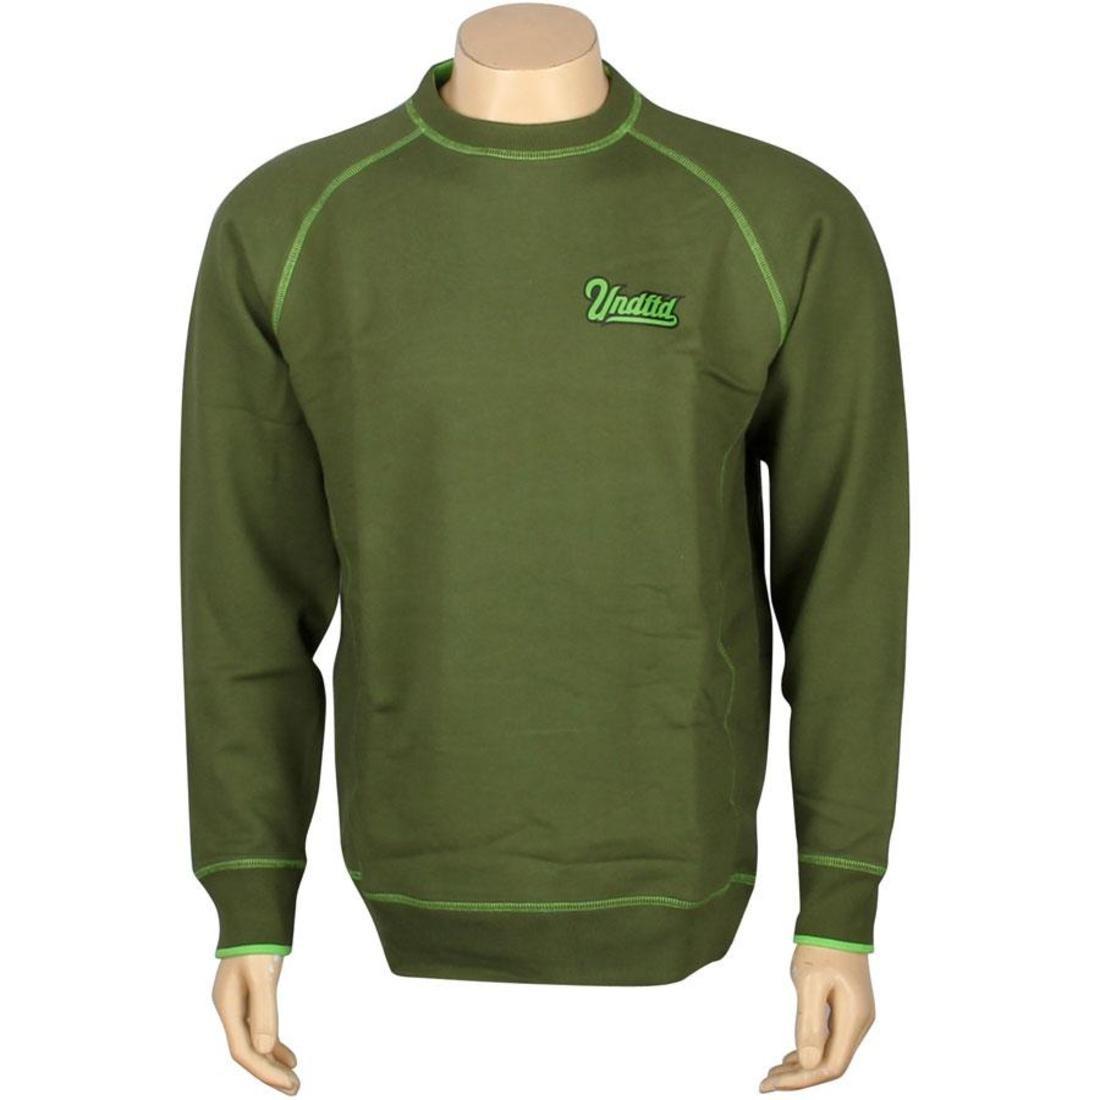 UNDEFEATED スクリプト ラグラン メンズファッション トップス Tシャツ カットソー メンズ 【 Script Raglan Crew (olive) 】 Olive